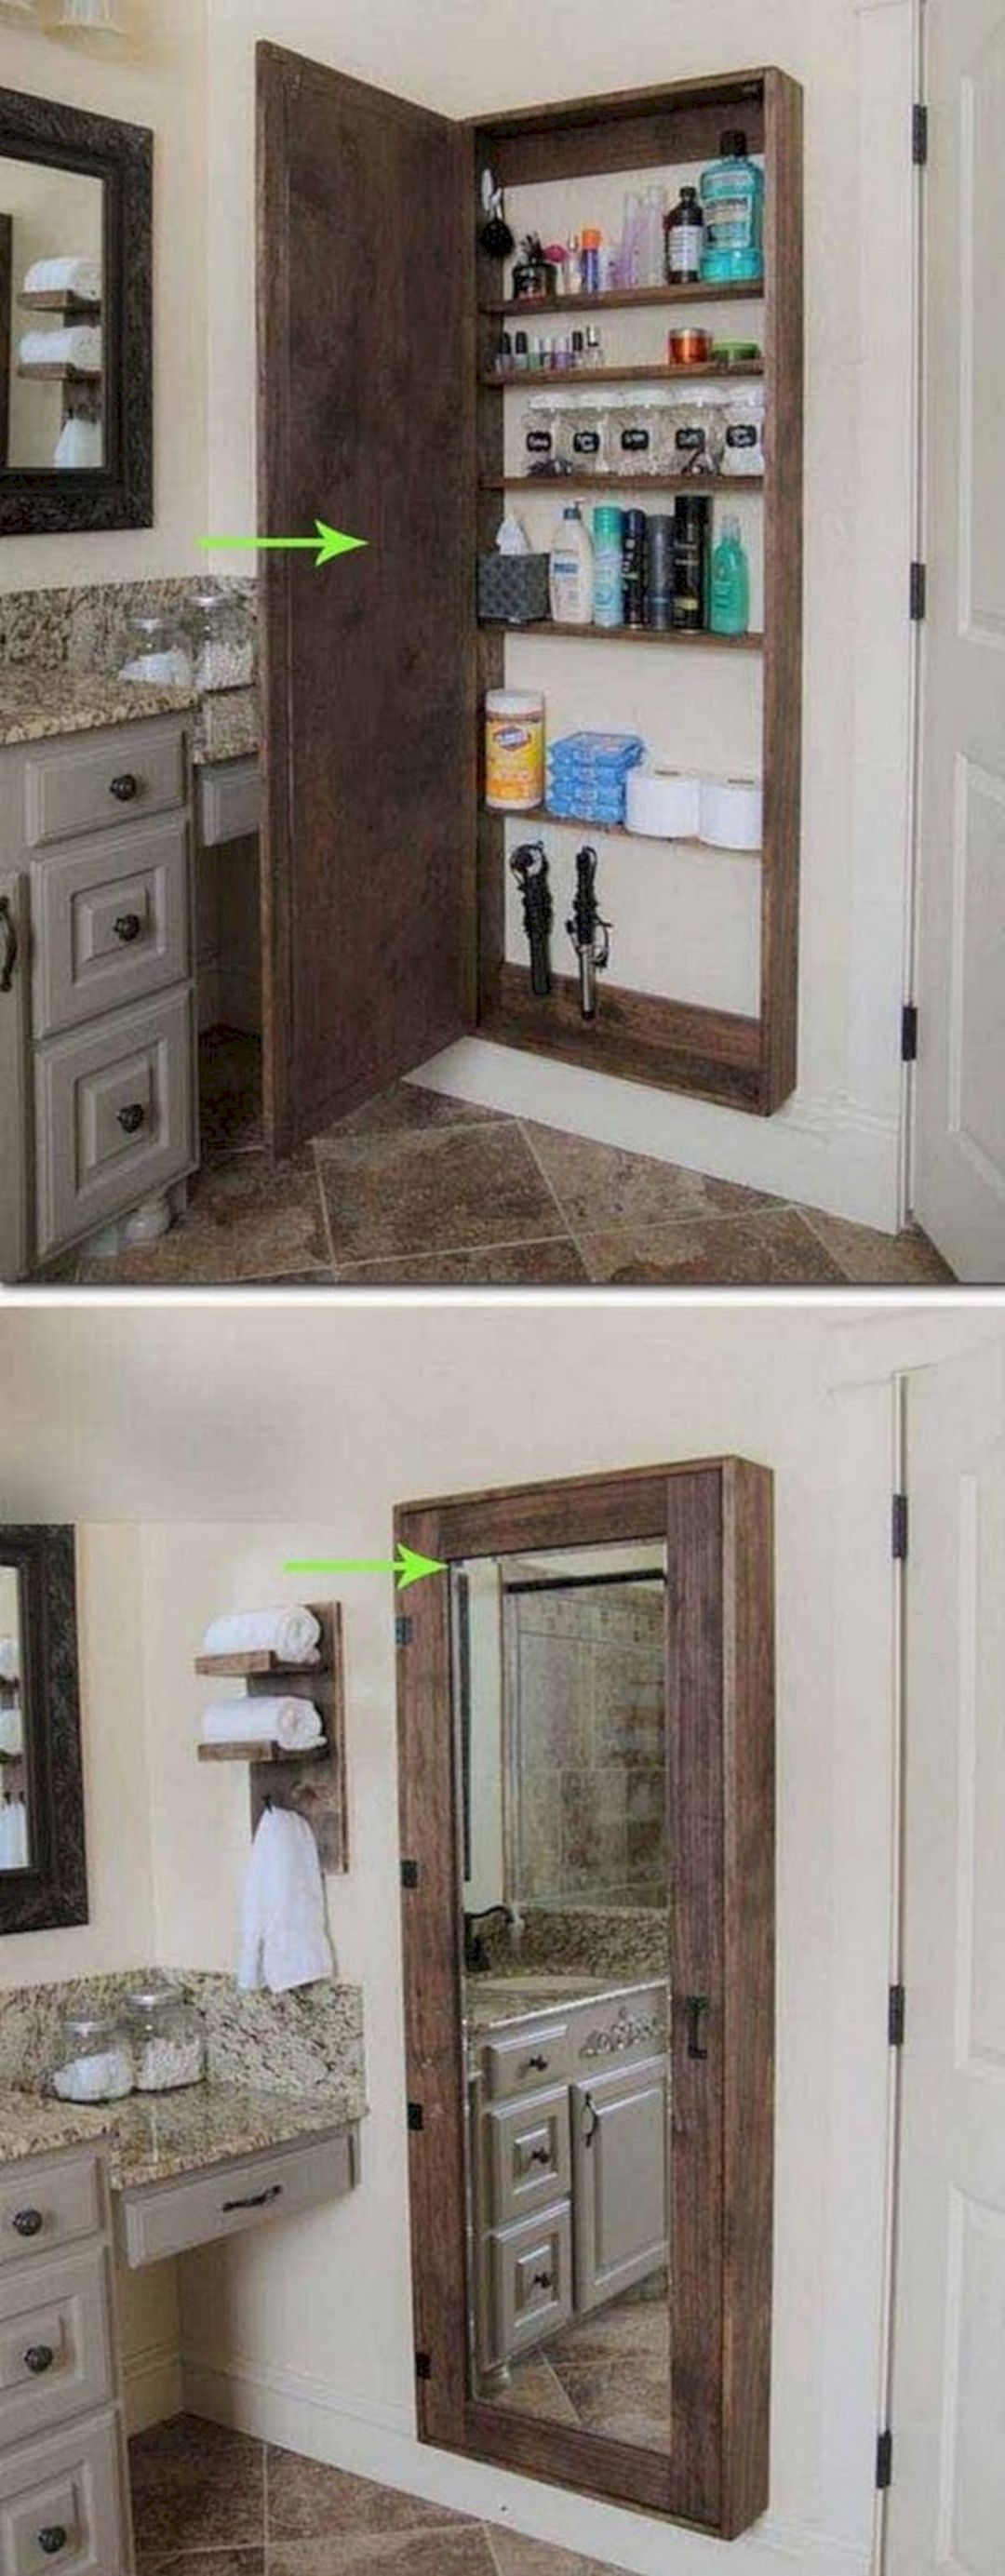 123 Best Inspirations Smart Home Renovation Ideas On A Budget 9901 ...